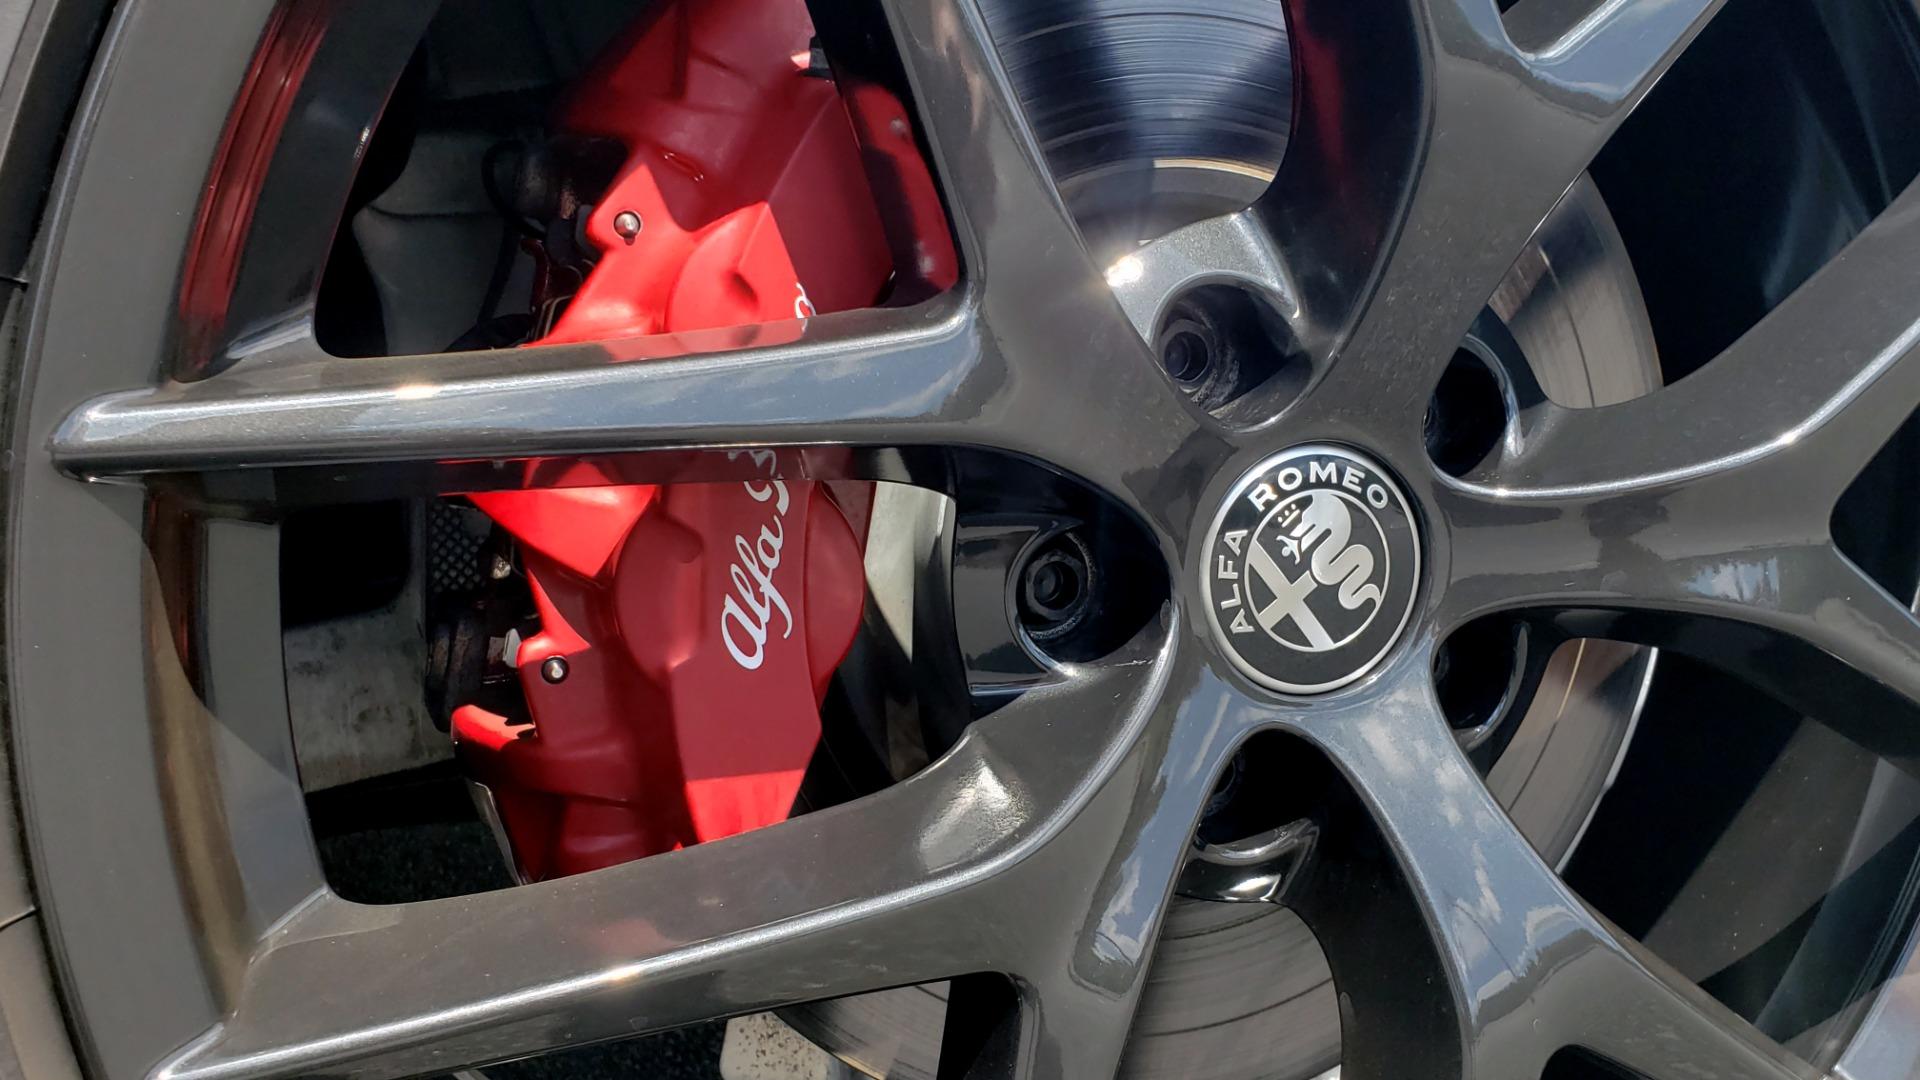 Used 2019 Alfa Romeo STELVIO TI SPORT AWD / 2.0L TURBO / 8-SPD AUTO / DRVR ASST / REARVIEW for sale $37,495 at Formula Imports in Charlotte NC 28227 14